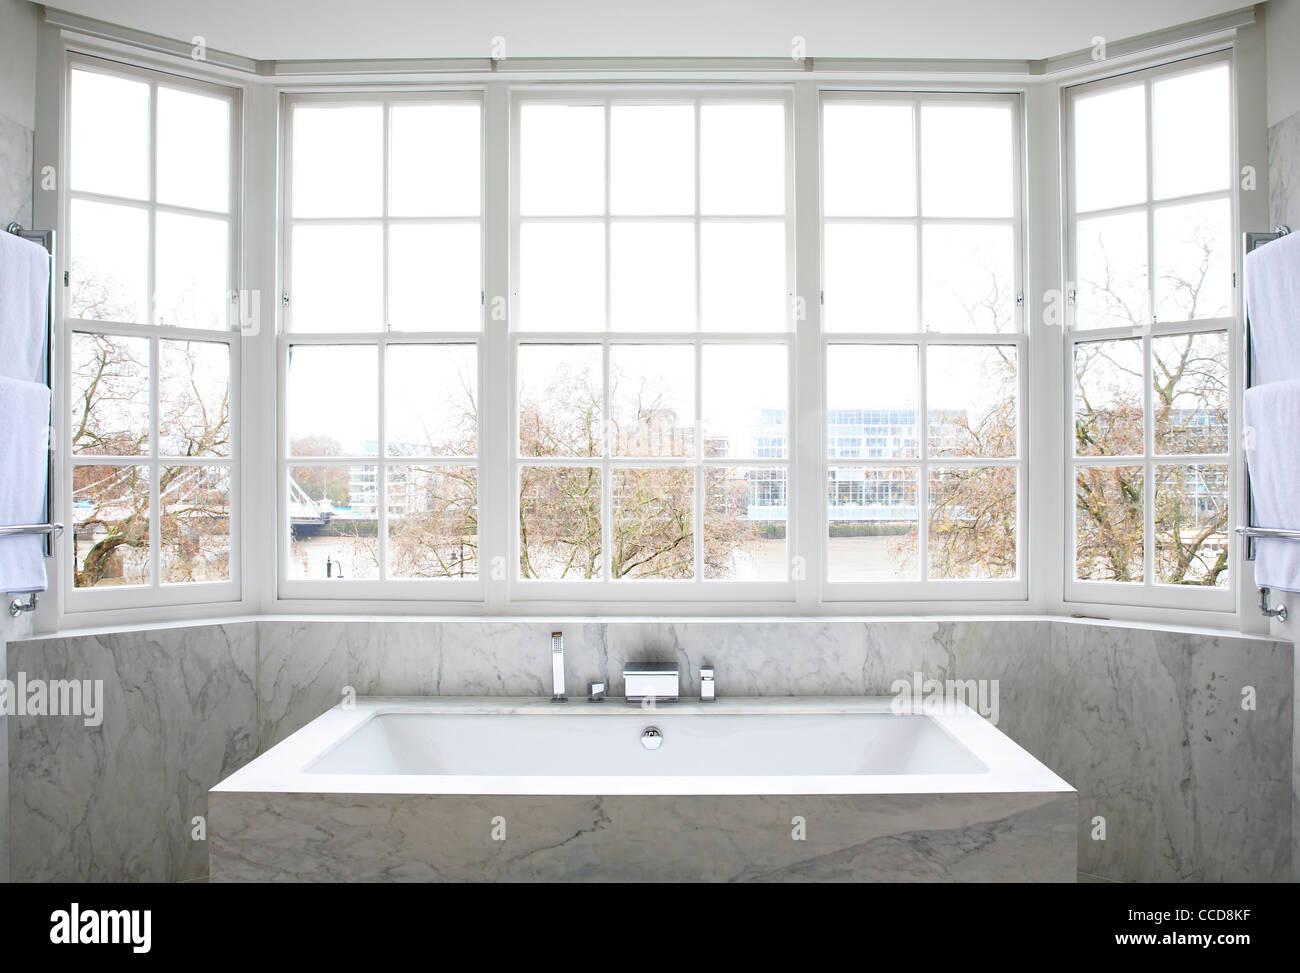 Private house, Stiff + Trevillion Architects Ltd, London, UK, 2010, Master bath - Stock Image